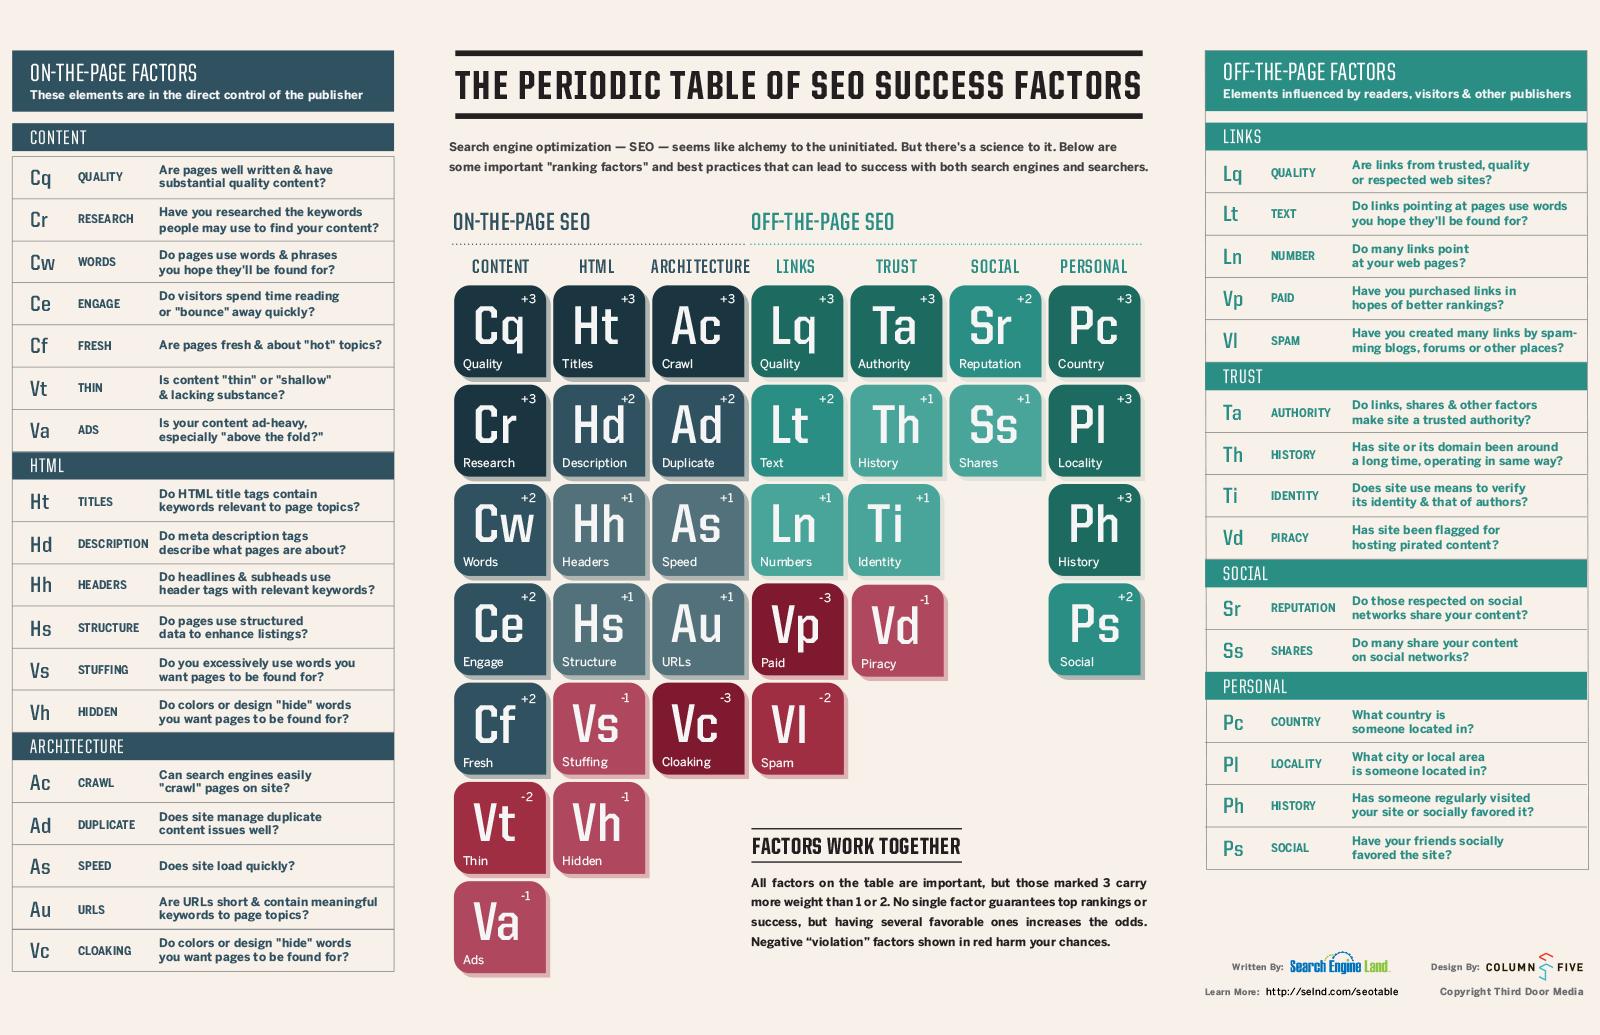 Seo success factors eproductions interactive web team eproductions new blog website 4 original periodic table of seo success factors gamestrikefo Images